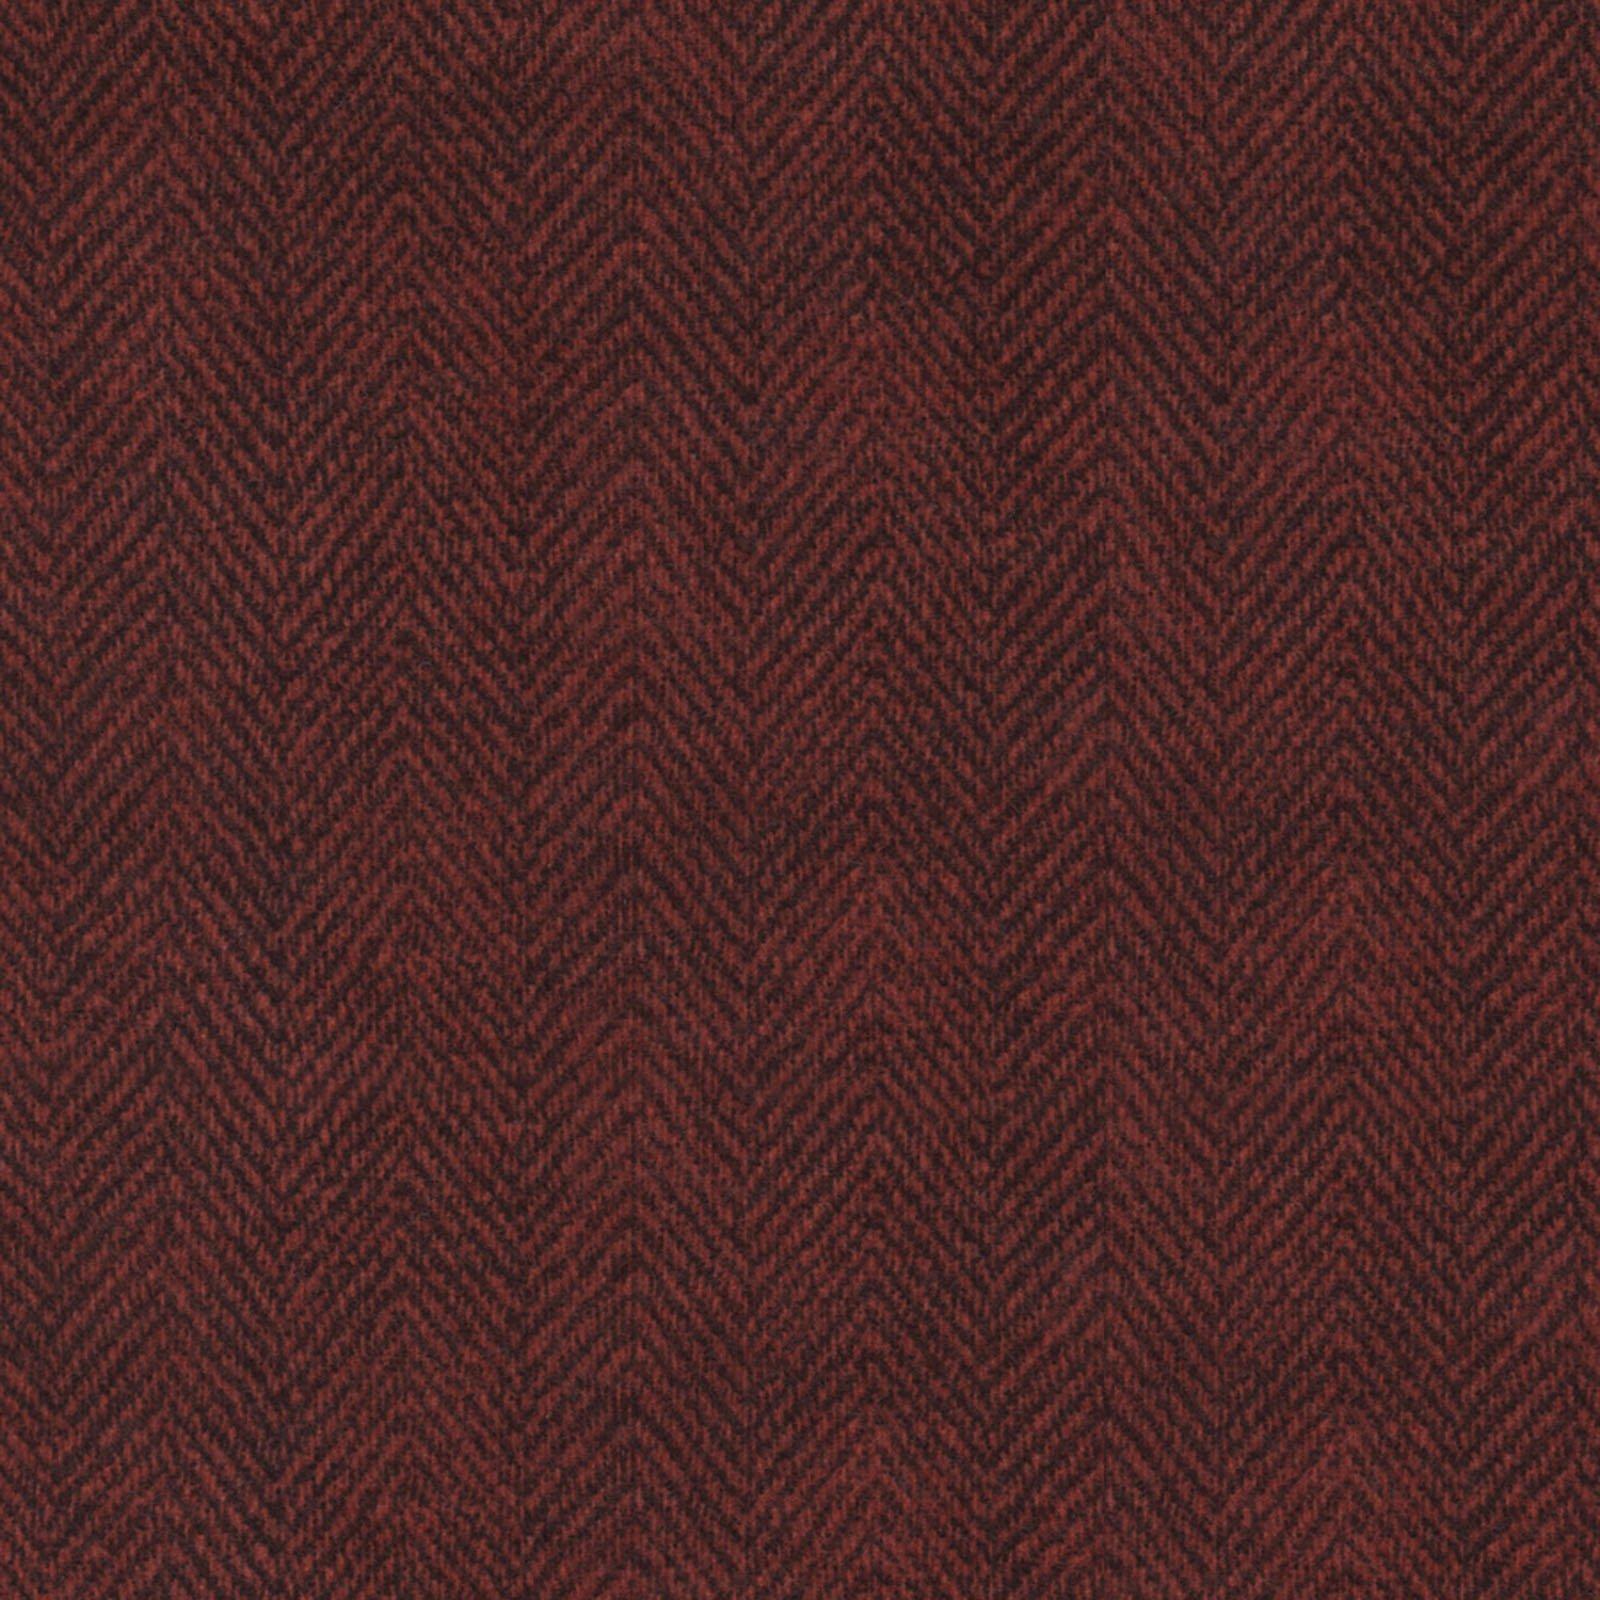 Woolies Flannel 1841-R2